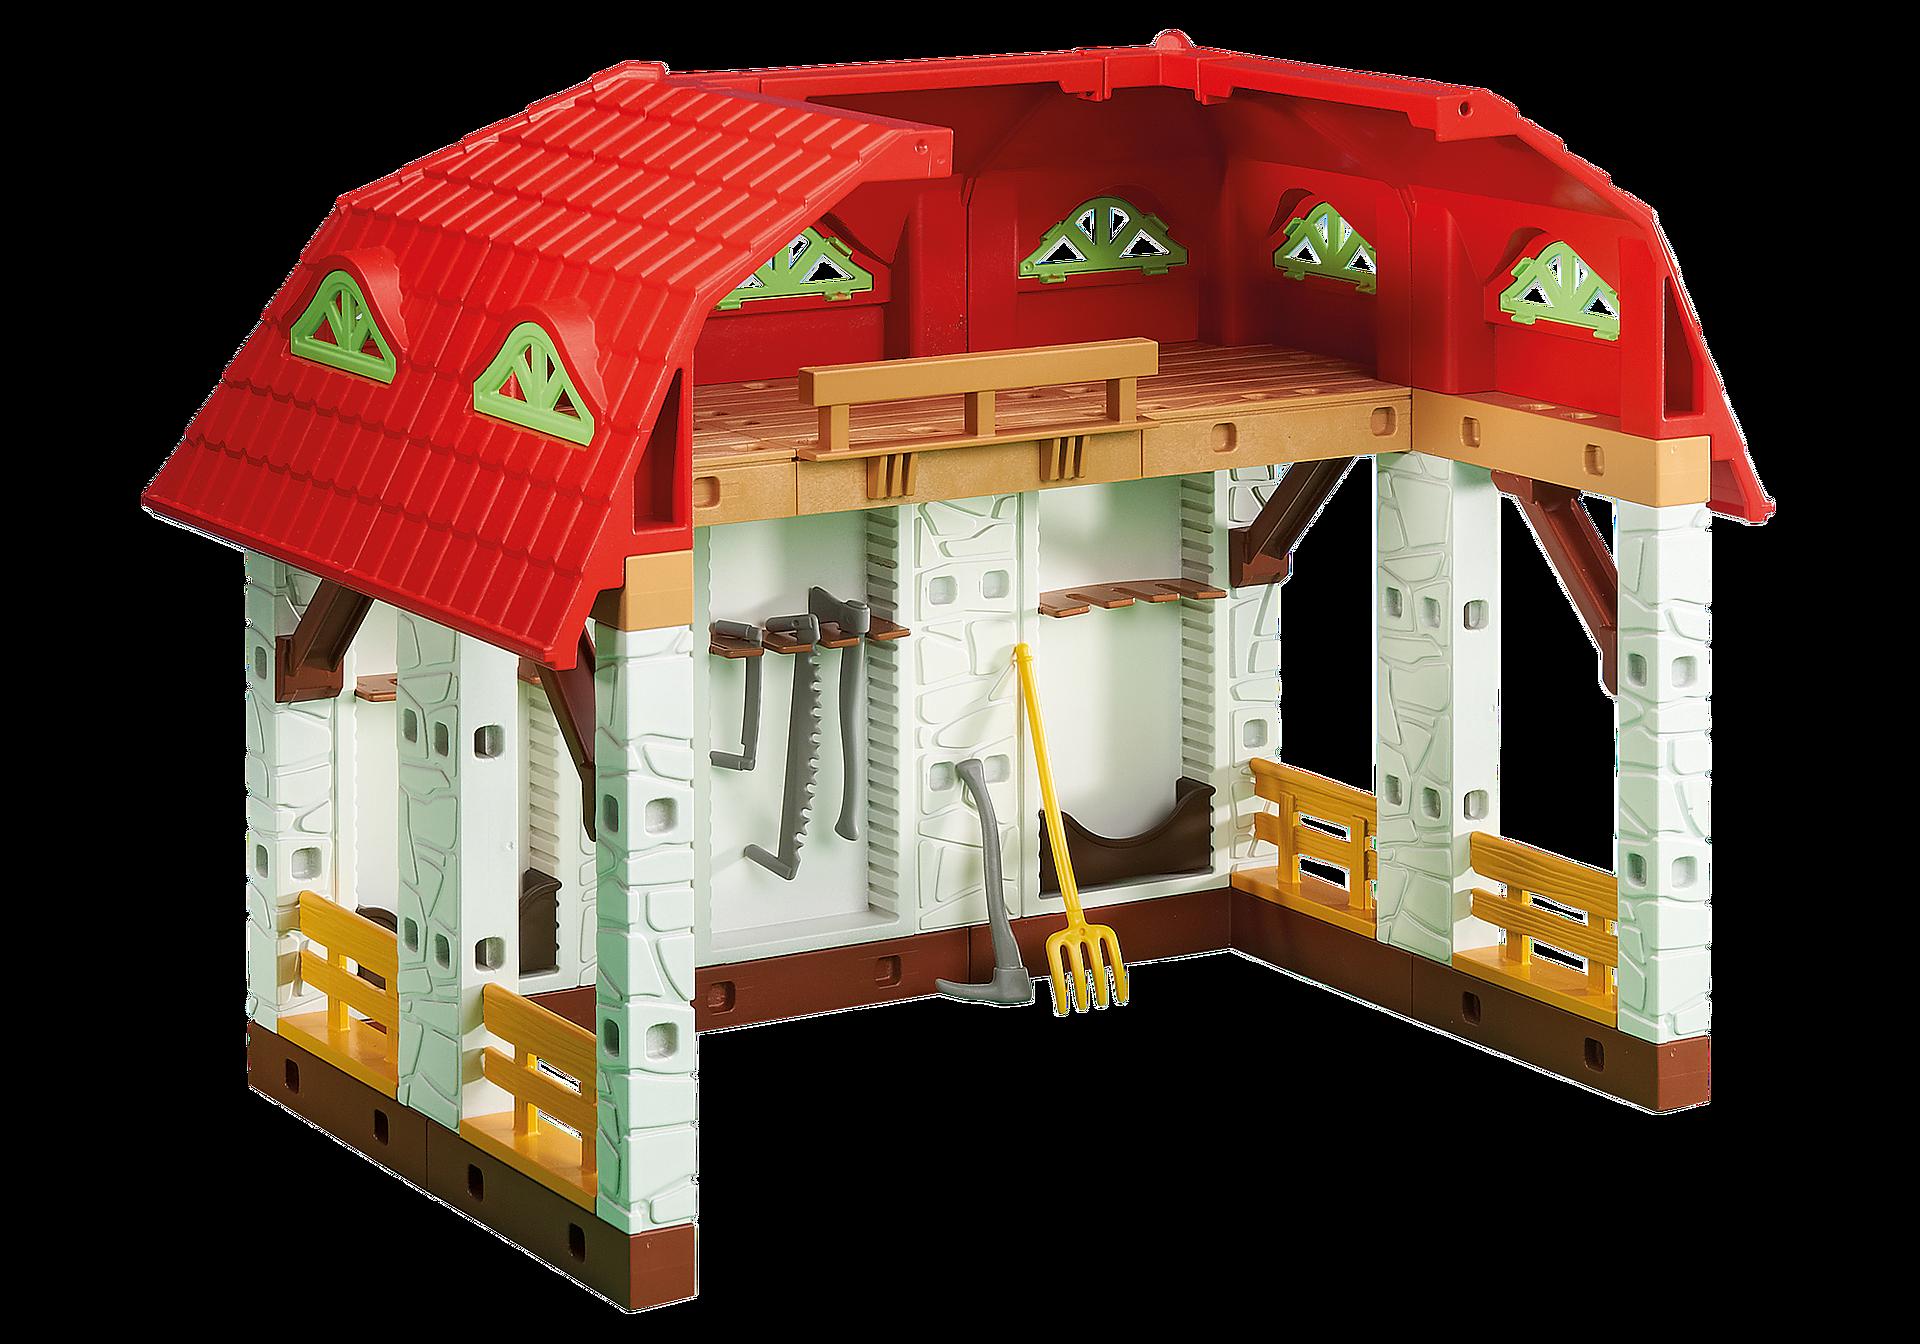 http://media.playmobil.com/i/playmobil/6368_product_detail/Maschinengebäude Bauernhof